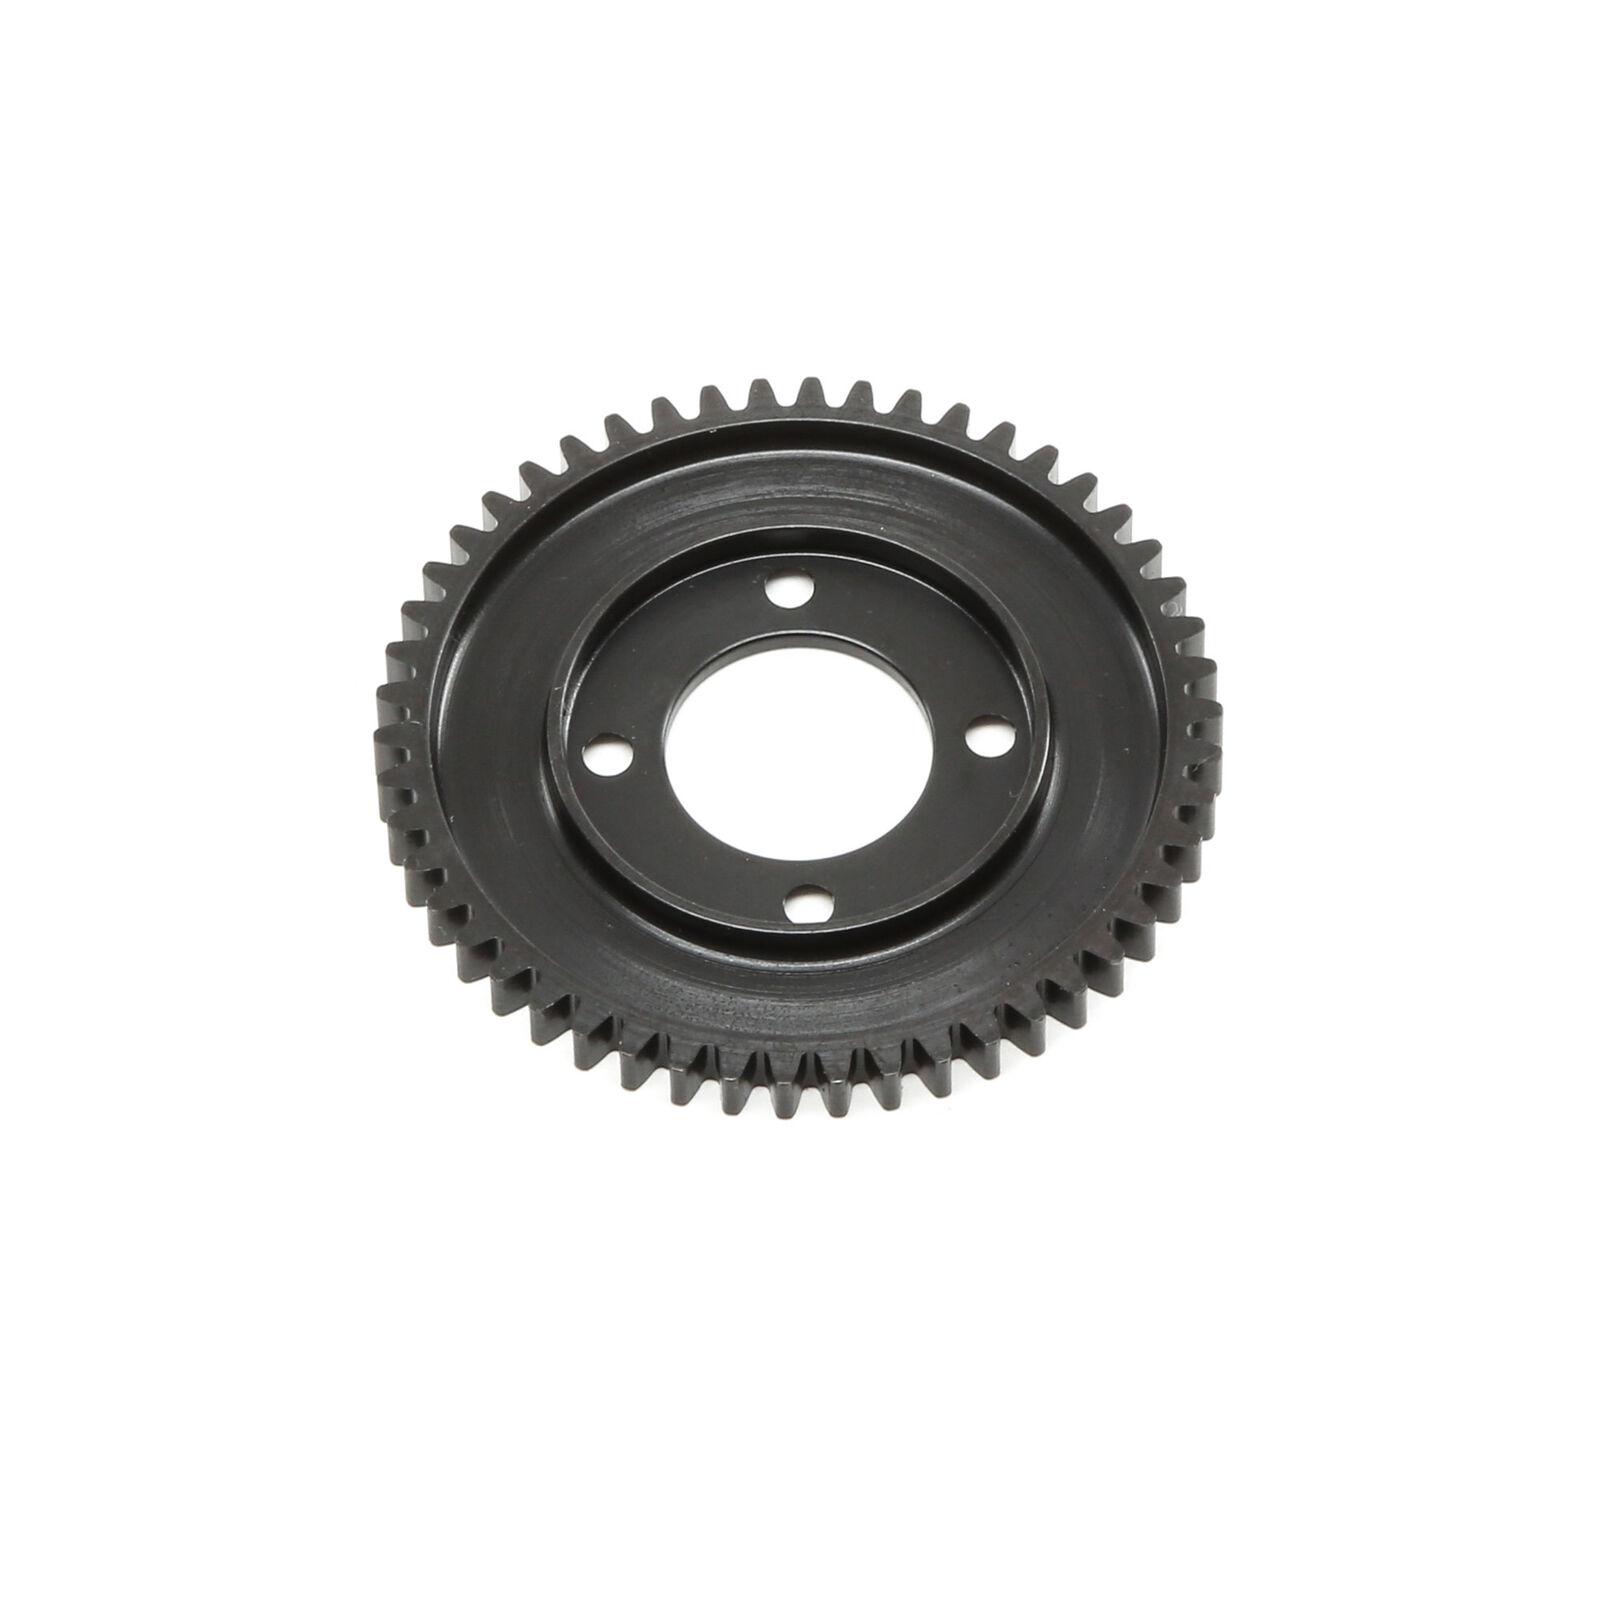 Spur Gear 50T: 8, 8T RTR